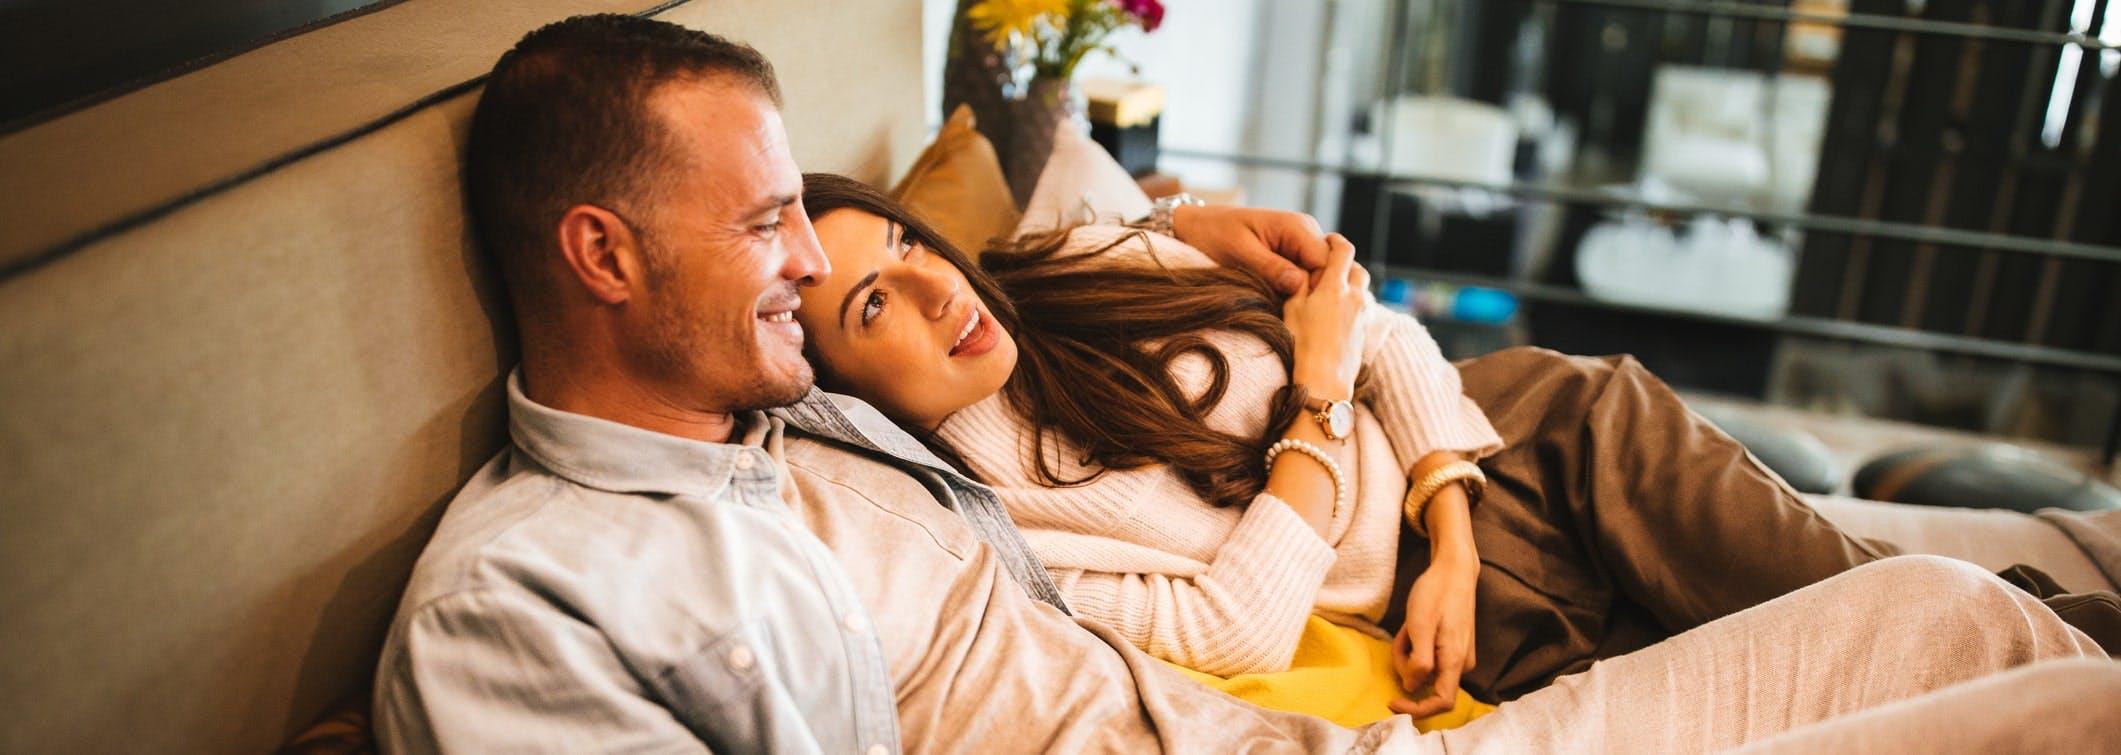 Couple on sofa - fertility treatment - IVF donor eggs